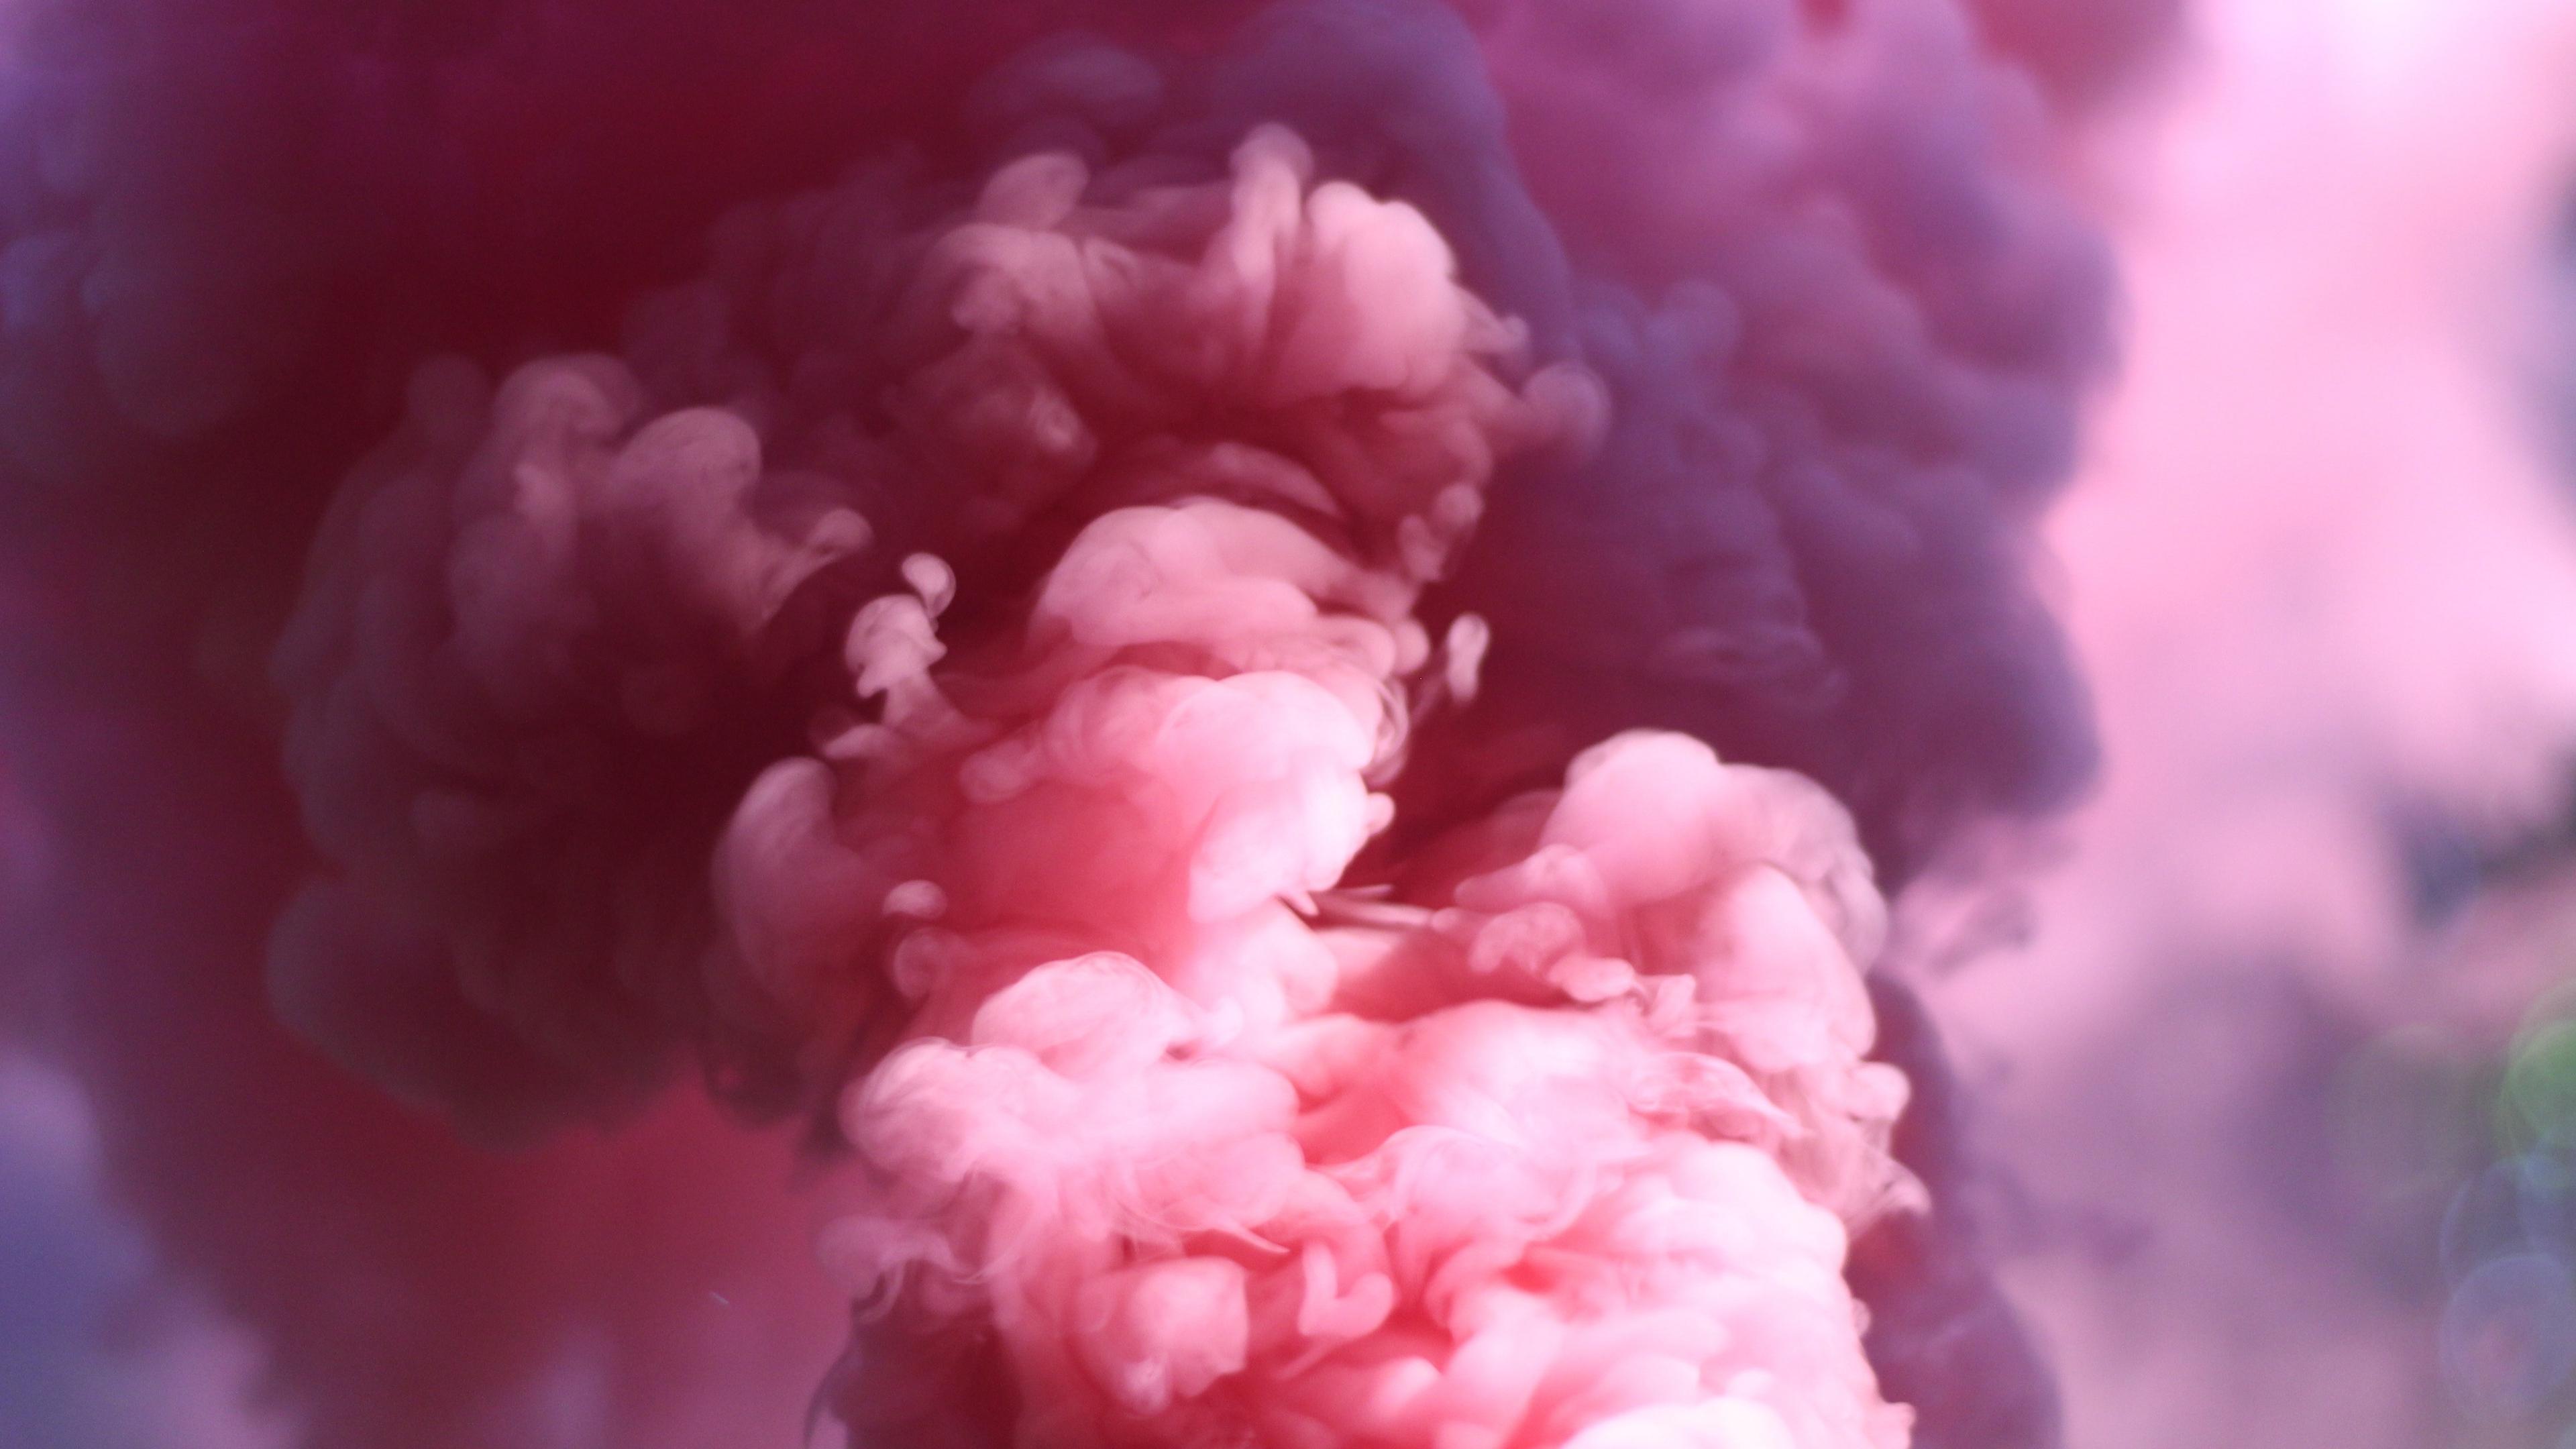 smoke pink shroud 4k 1539370284 - smoke, pink, shroud 4k - Smoke, shroud, Pink